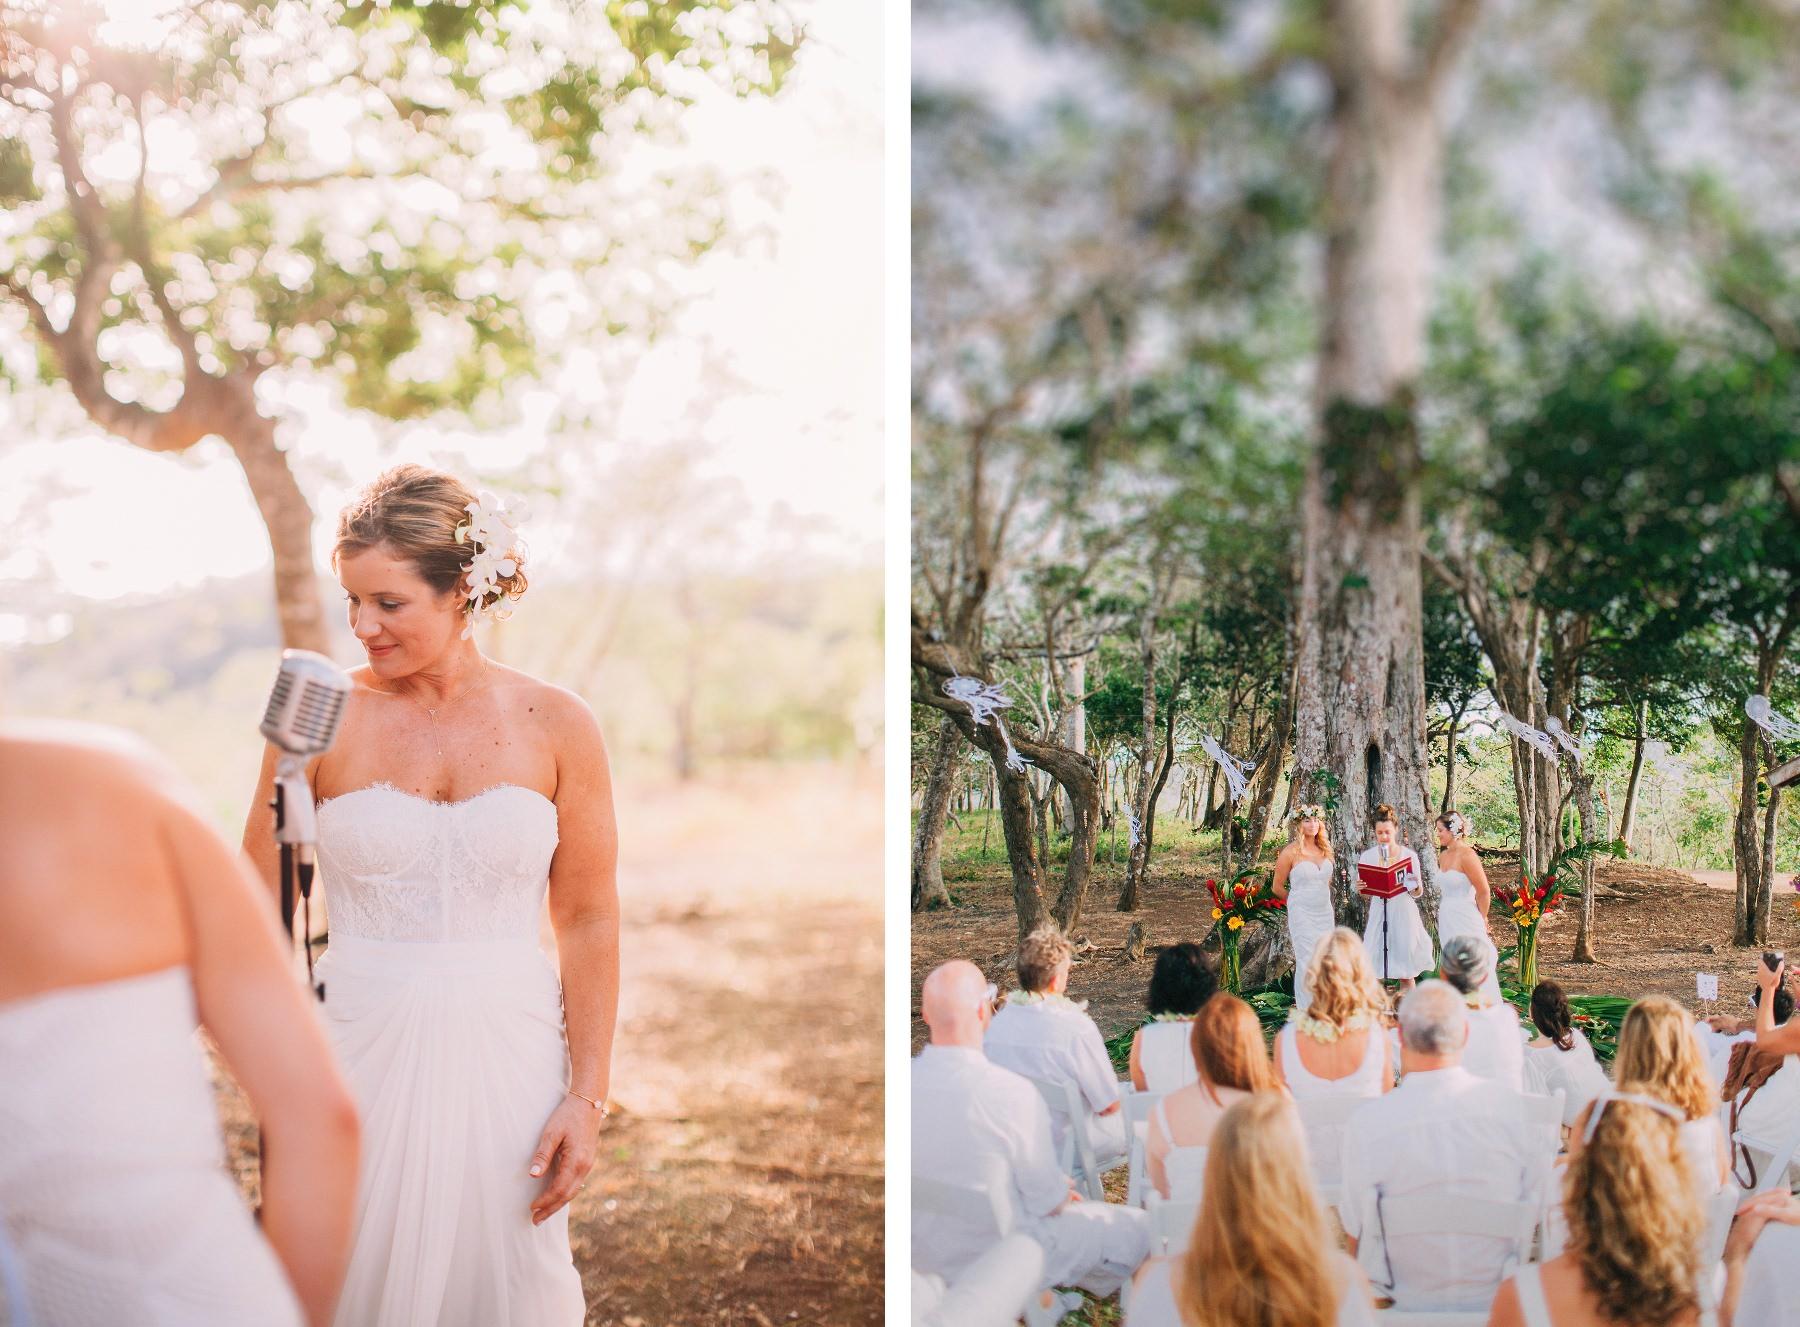 Boho Same-sex wedding under a tree in Costa Rica